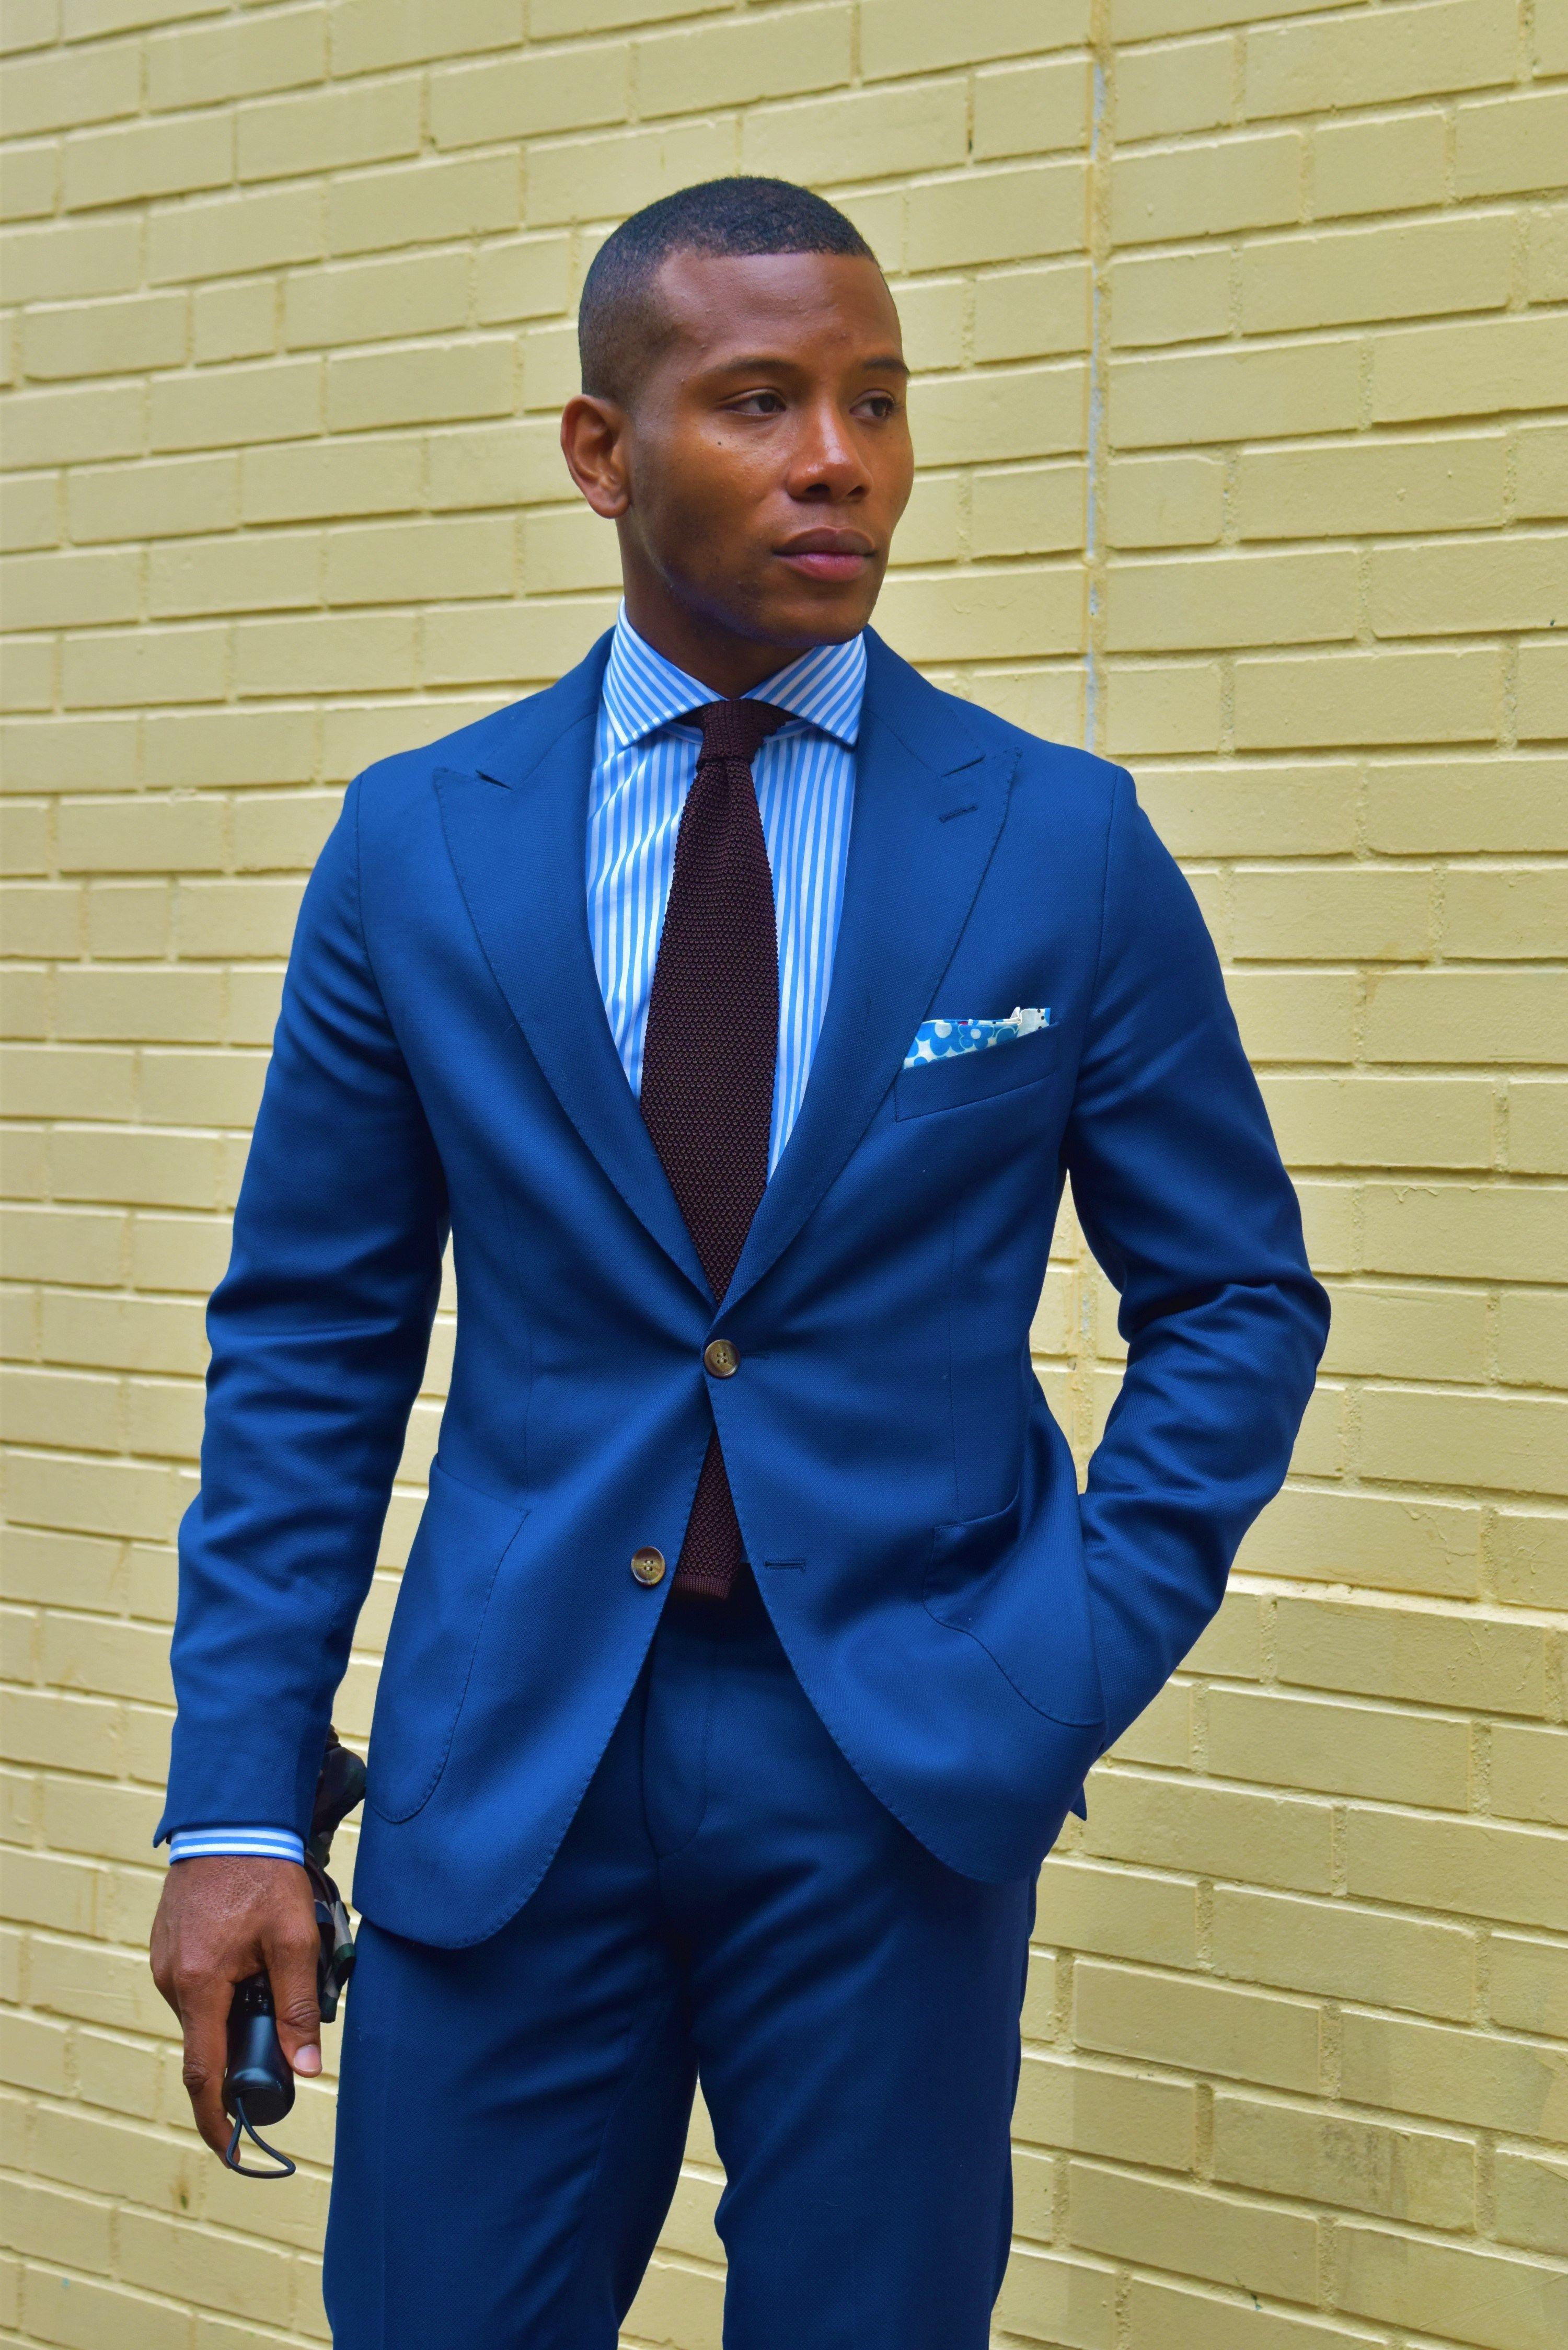 Blue suit + striped dress shirt + pocket square